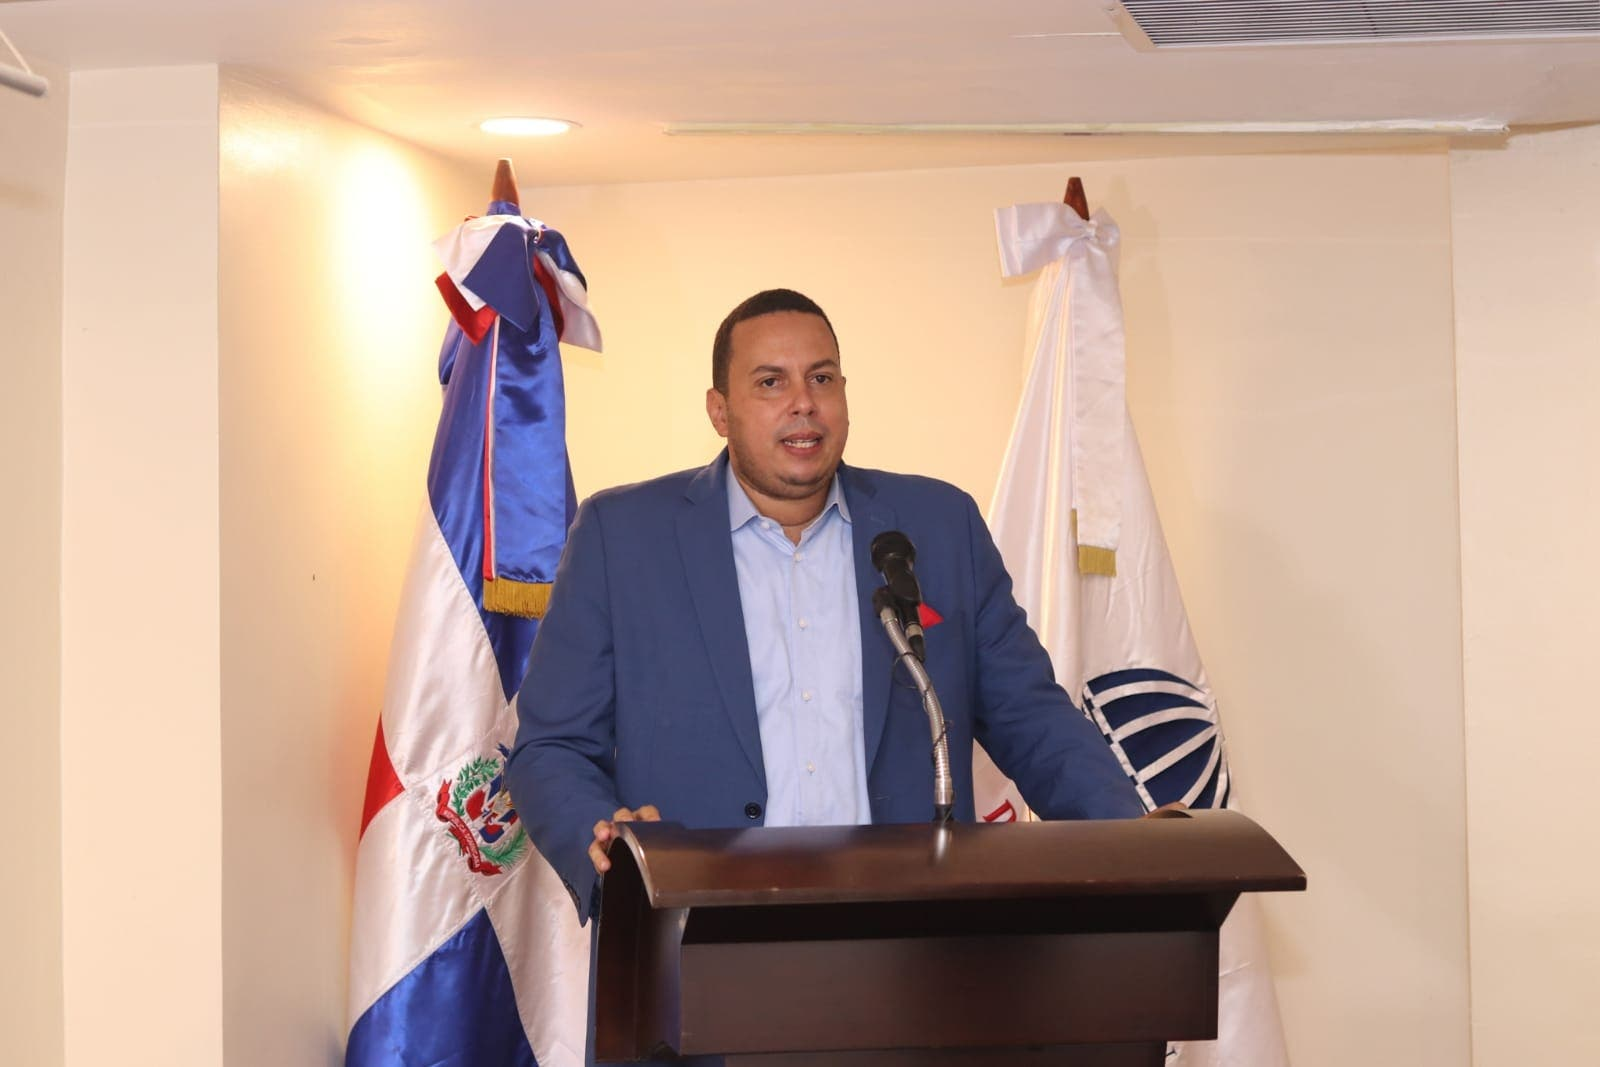 Regidor Manuel Núñez presidirá comité organizador torneo navideño